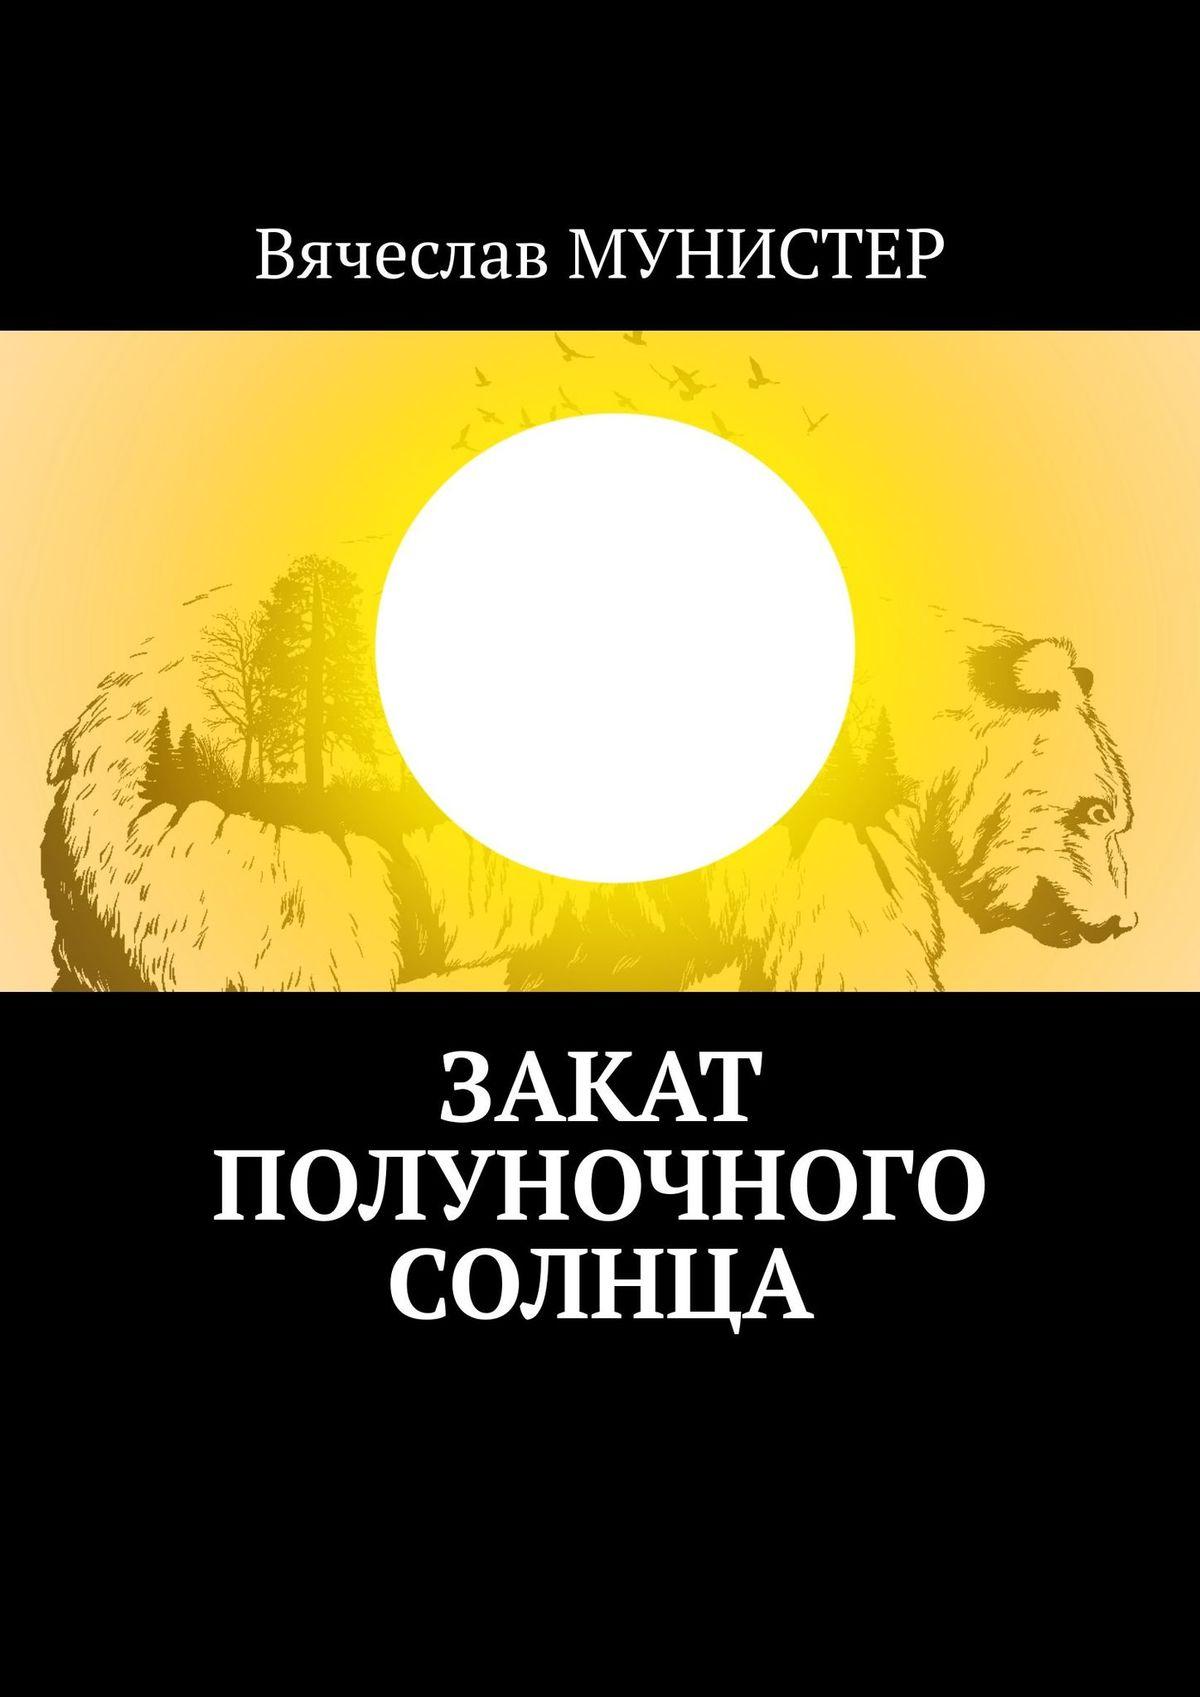 Вячеслав Мунистер Закат полуночного солнца авиабилеты петропавловск камчатский москва